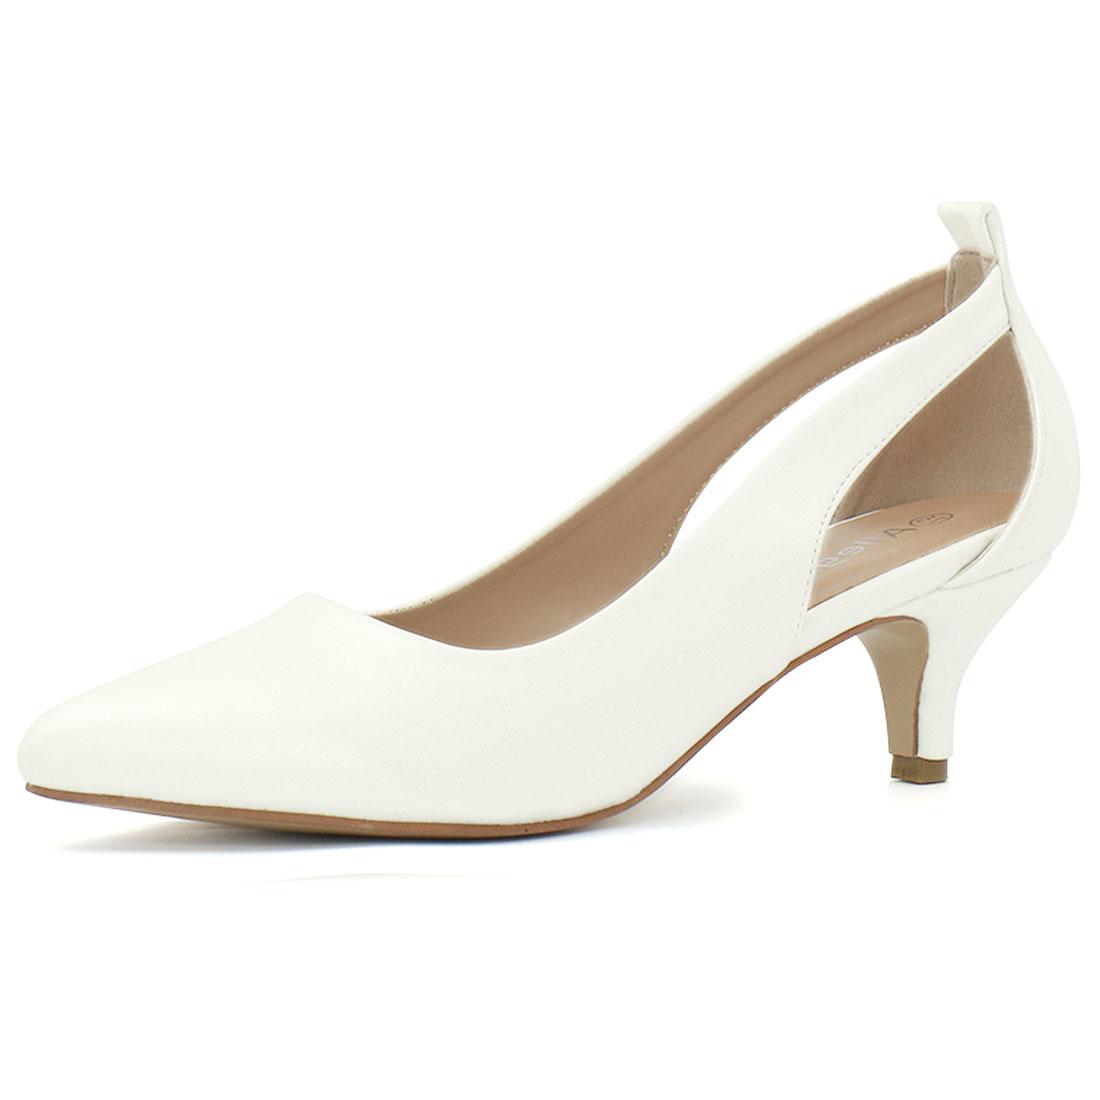 Allegra K Women's Cutout Sides Kitten Heel Pointed Toe Pumps White US 5.5